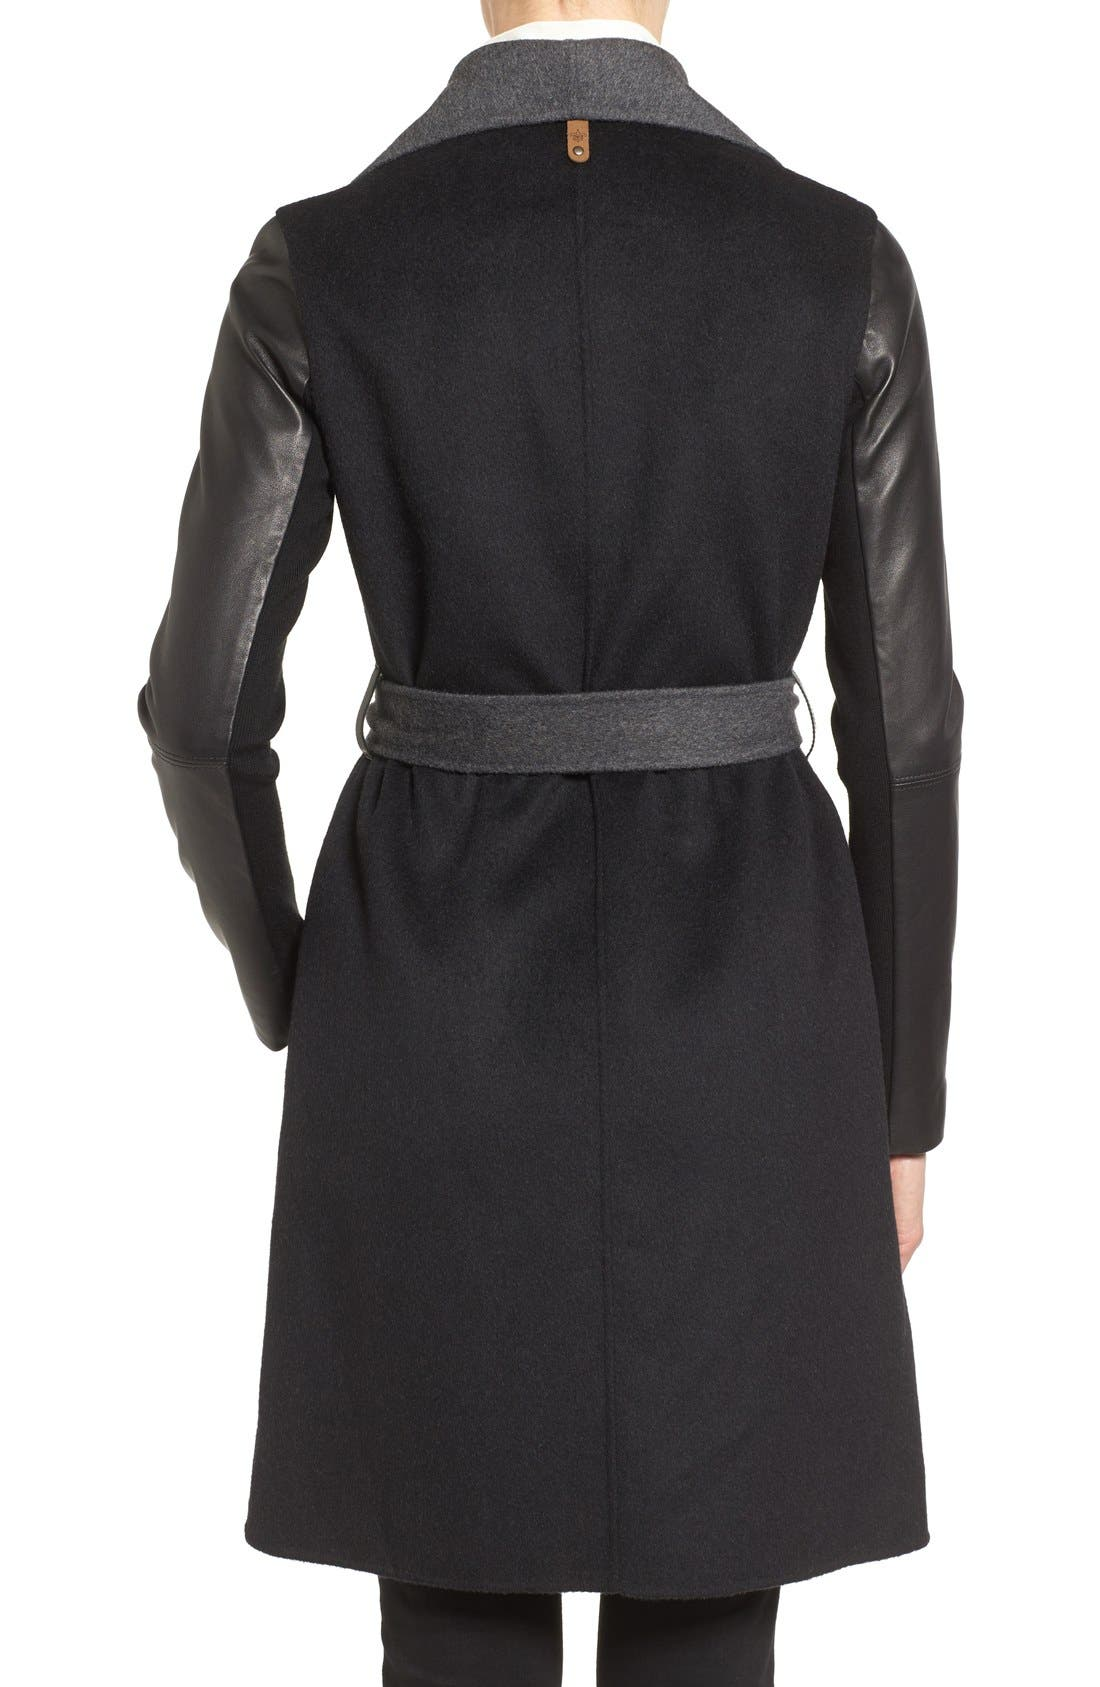 MACKAGE, Leather Sleeve Wool Blend Wrap Coat, Alternate thumbnail 2, color, 001